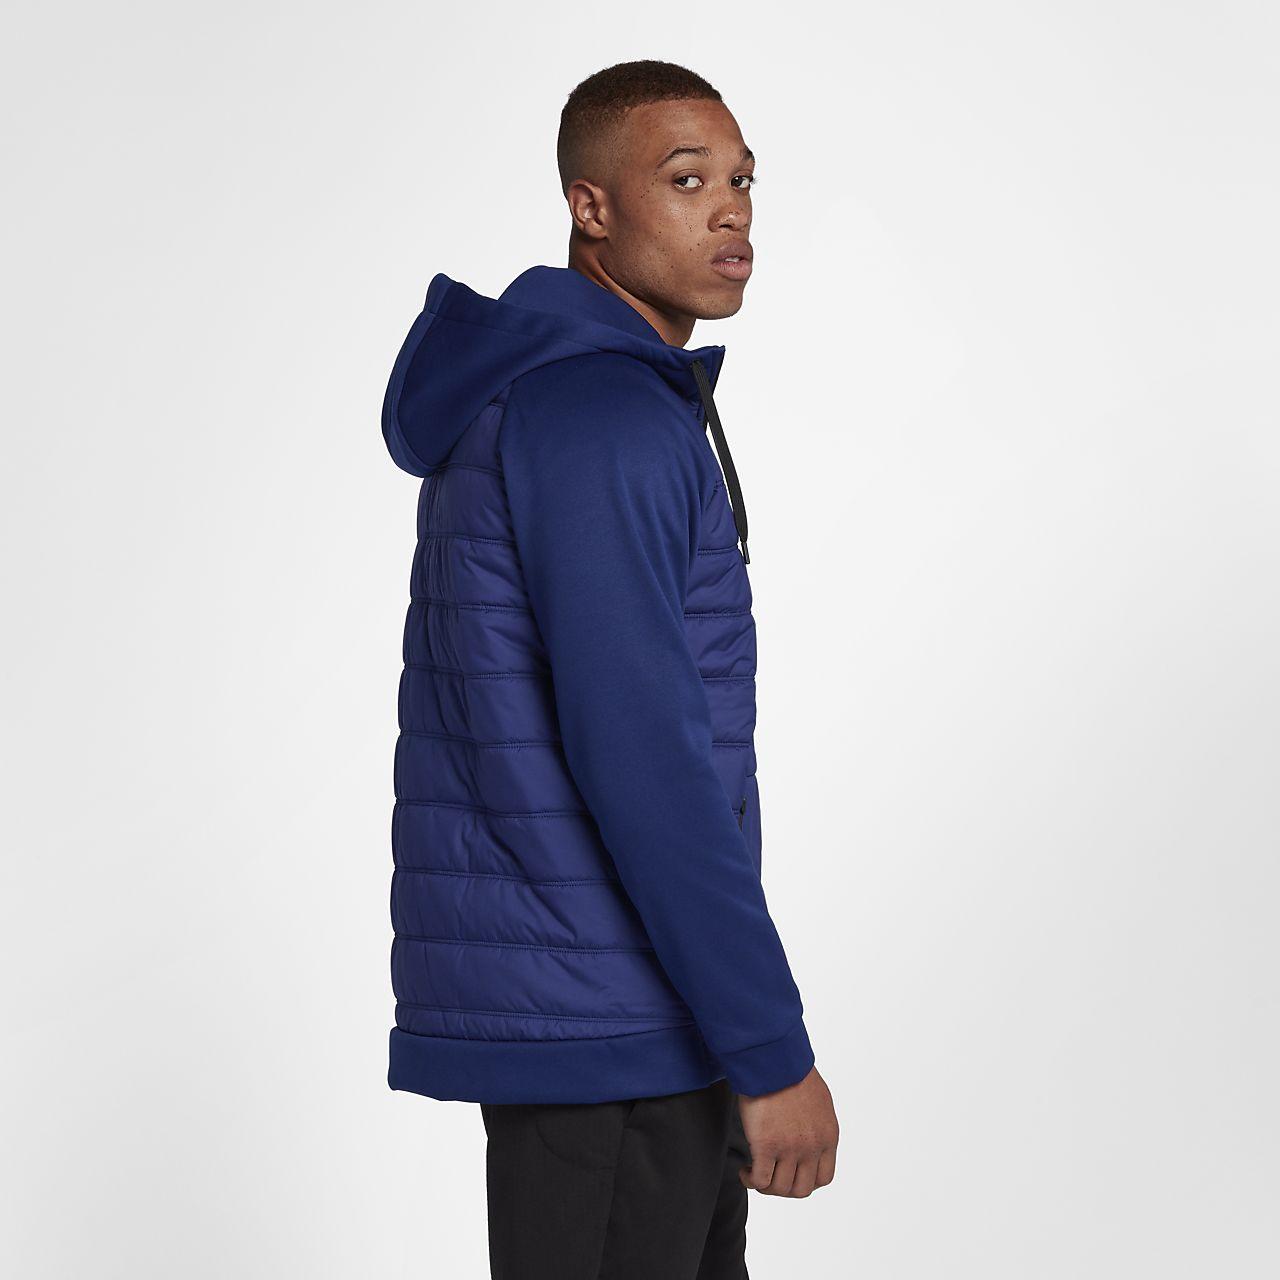 5ffd6997f2bd Nike Therma Winterized Men s Full-Zip Hoodie. Nike.com